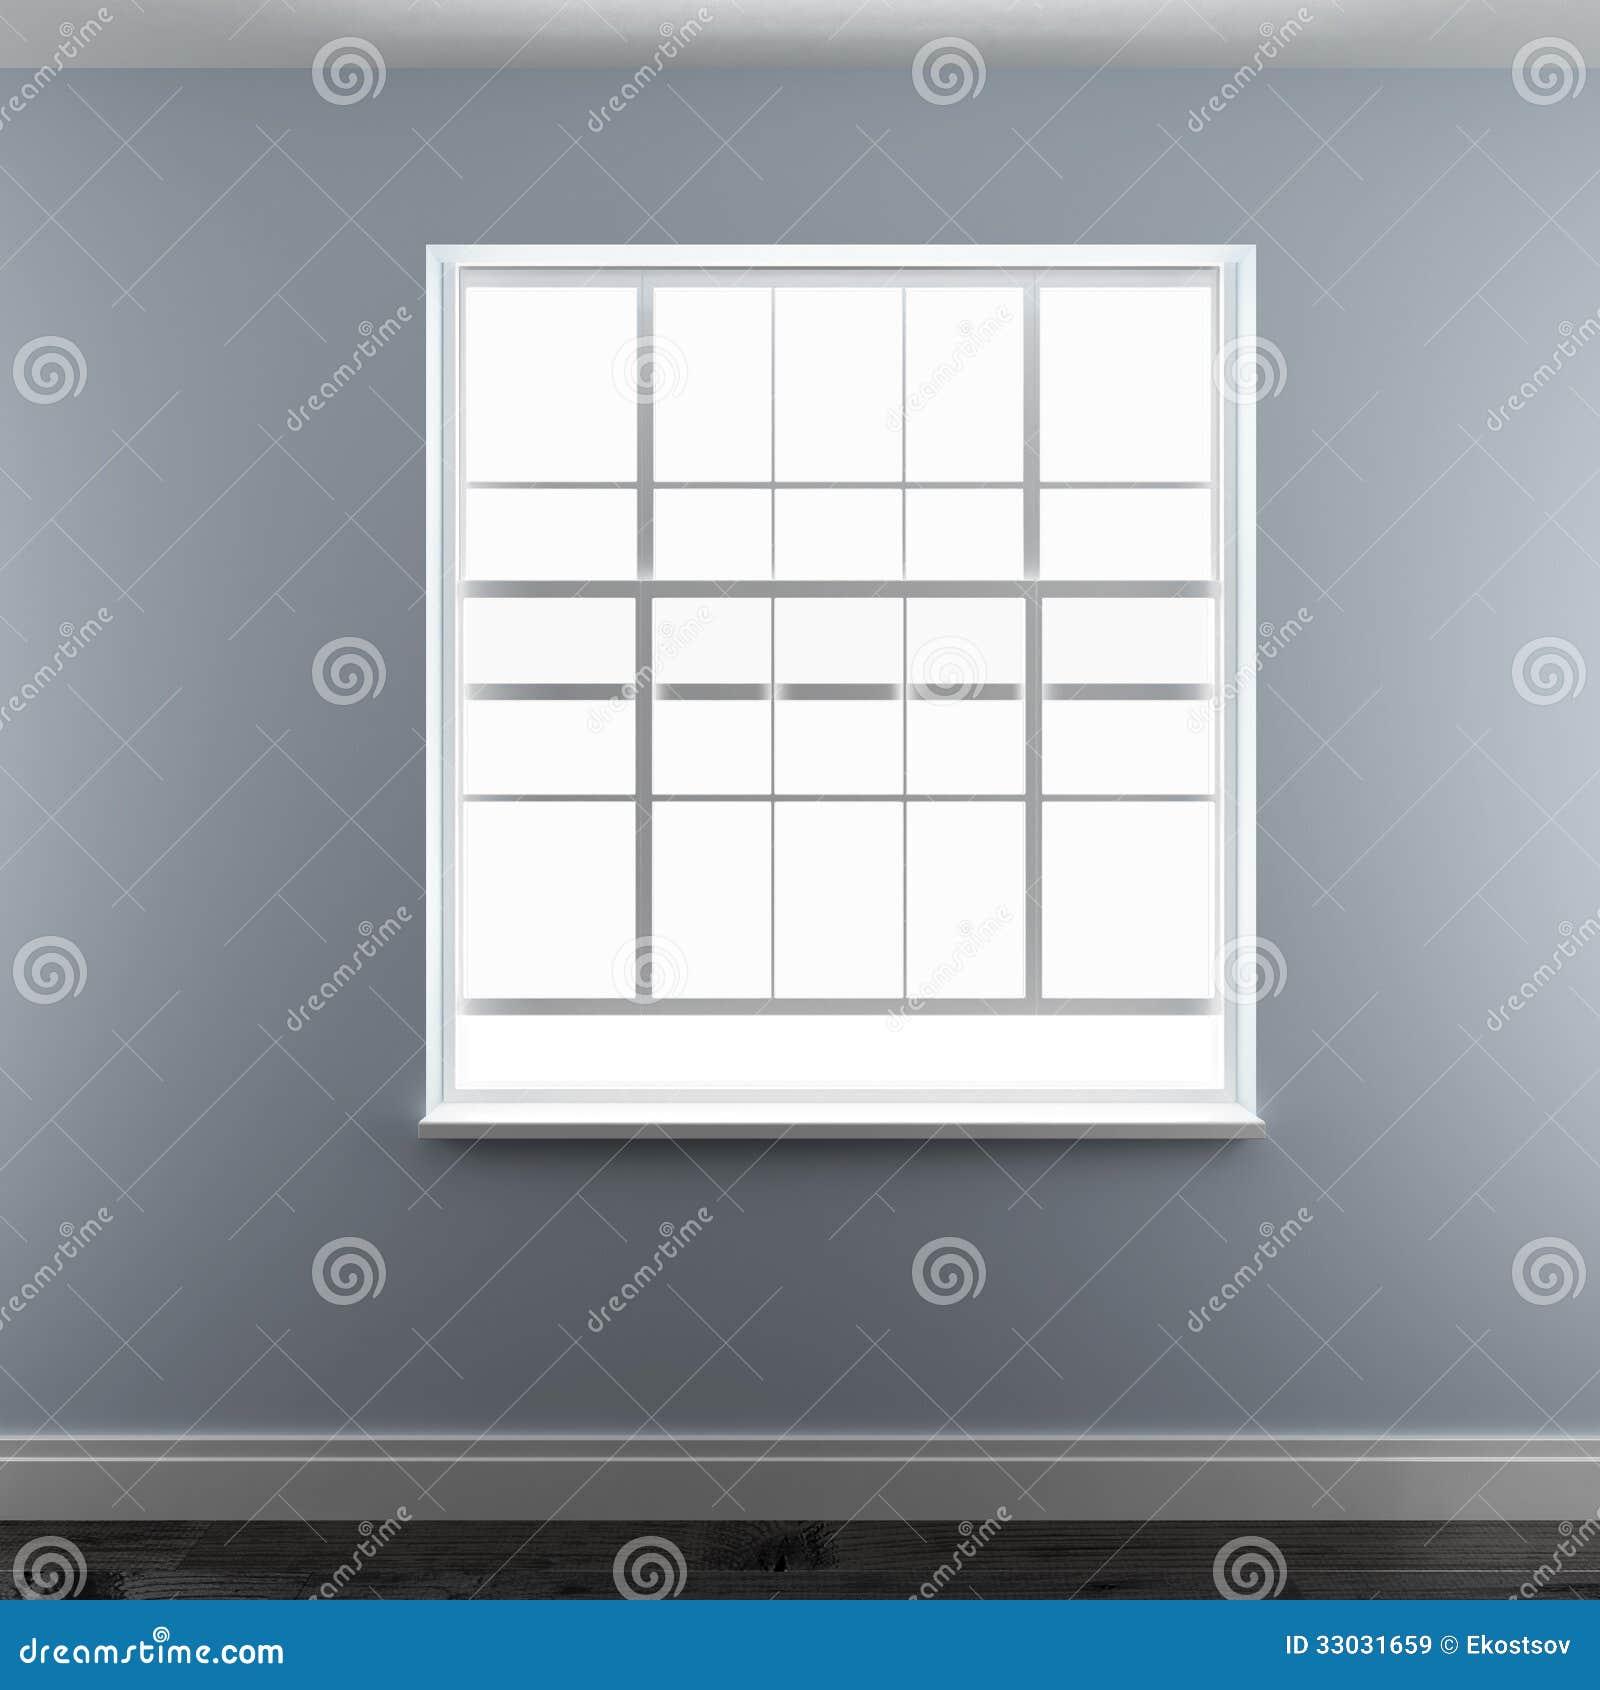 Modern residential window royalty free stock images for Modern window design residential